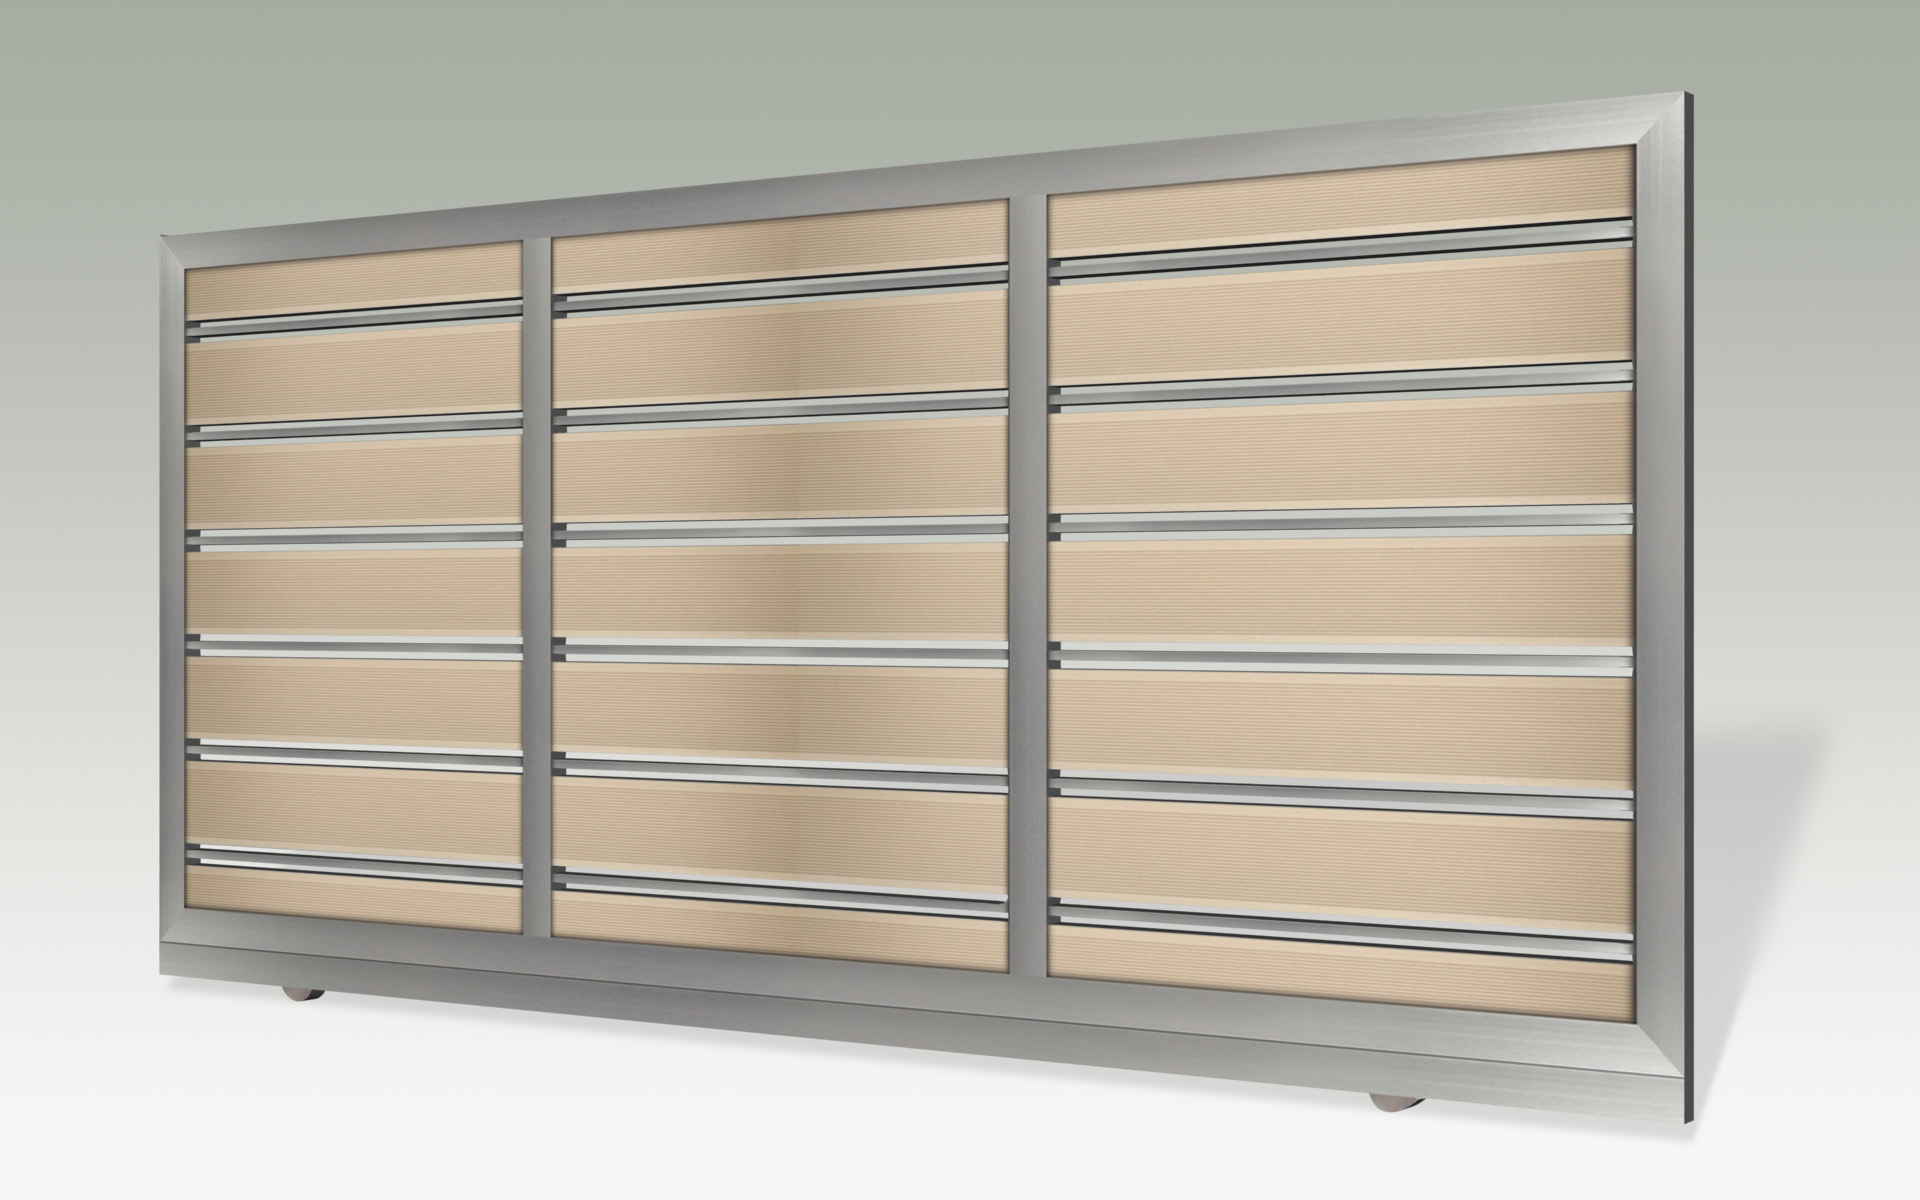 Styledoors ayloporta modern m492